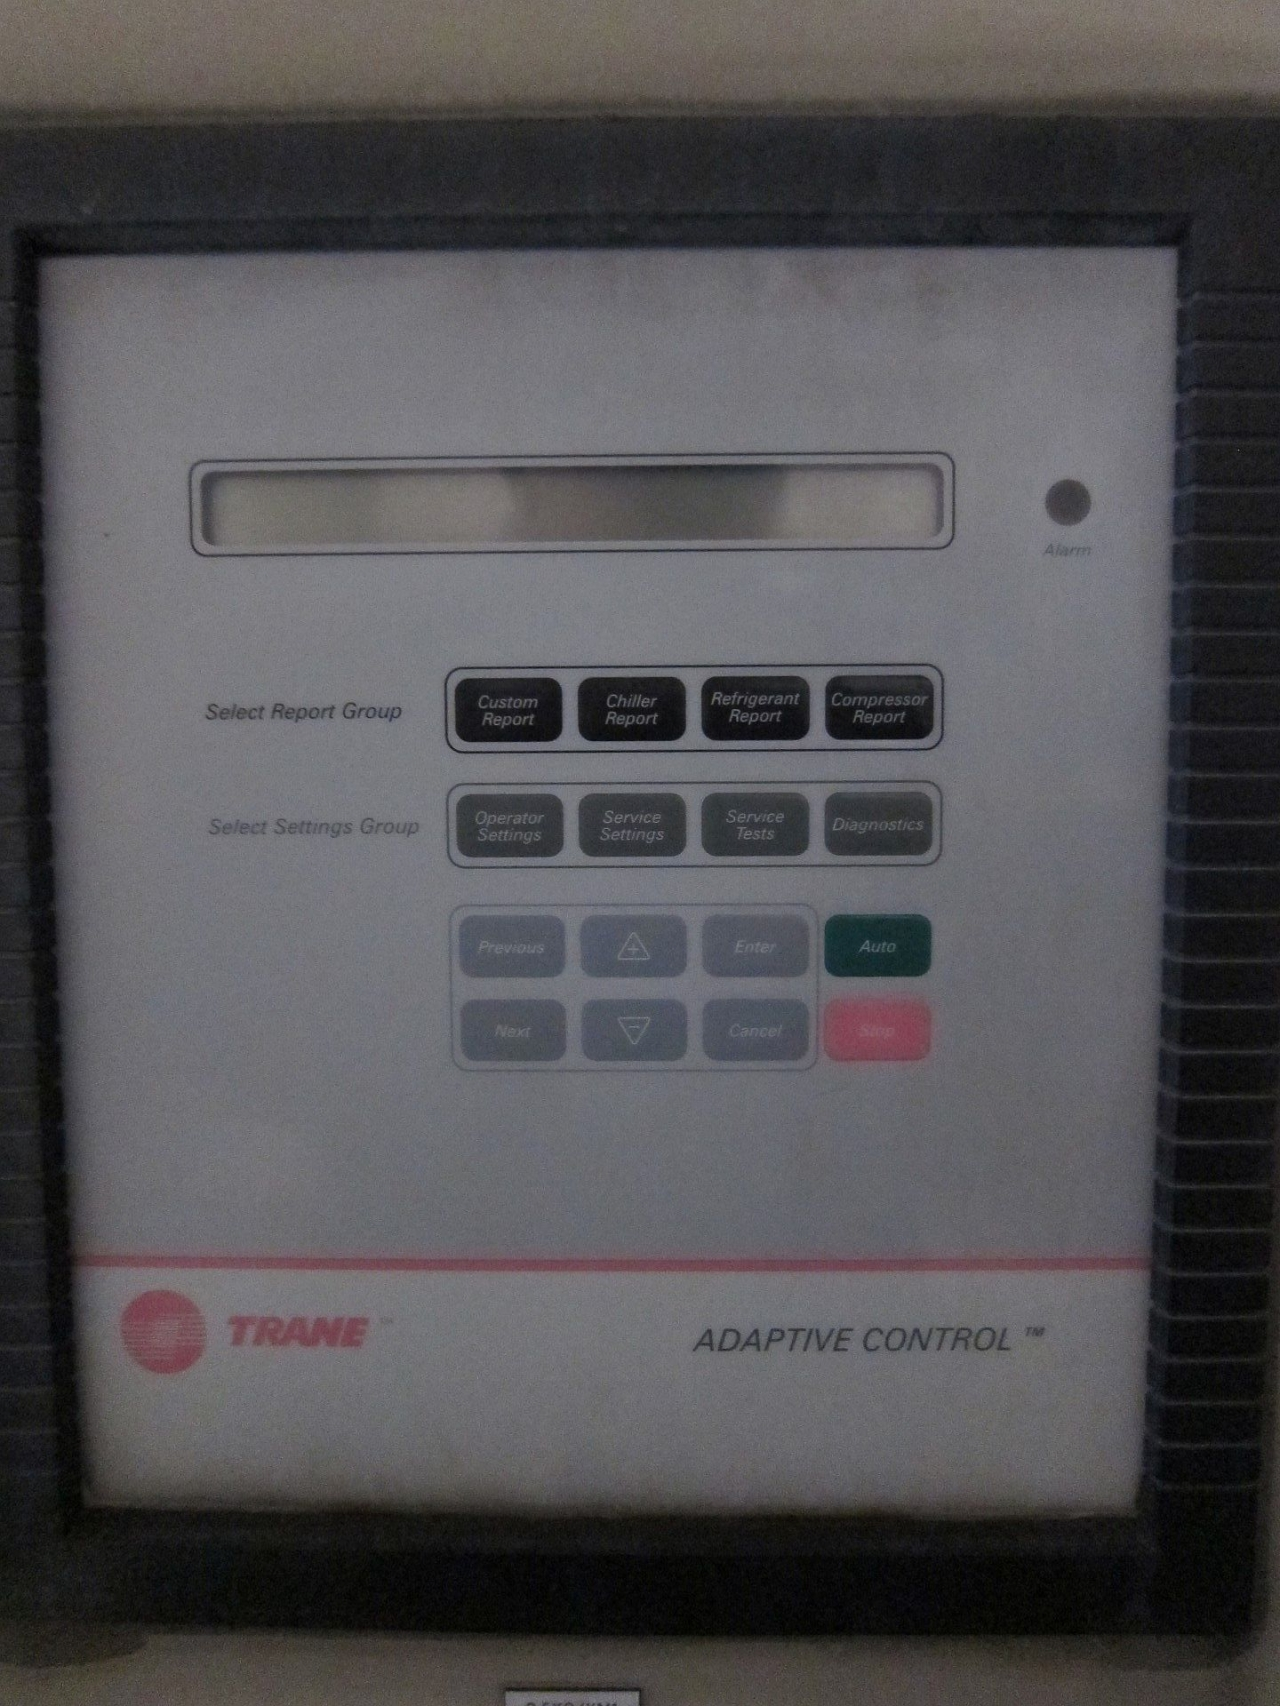 hos bv gebruikte koeltechniek used refrigeration equipment rh hosbv com trane rtac chiller manual trane rtaa chiller manuals troubleshooting